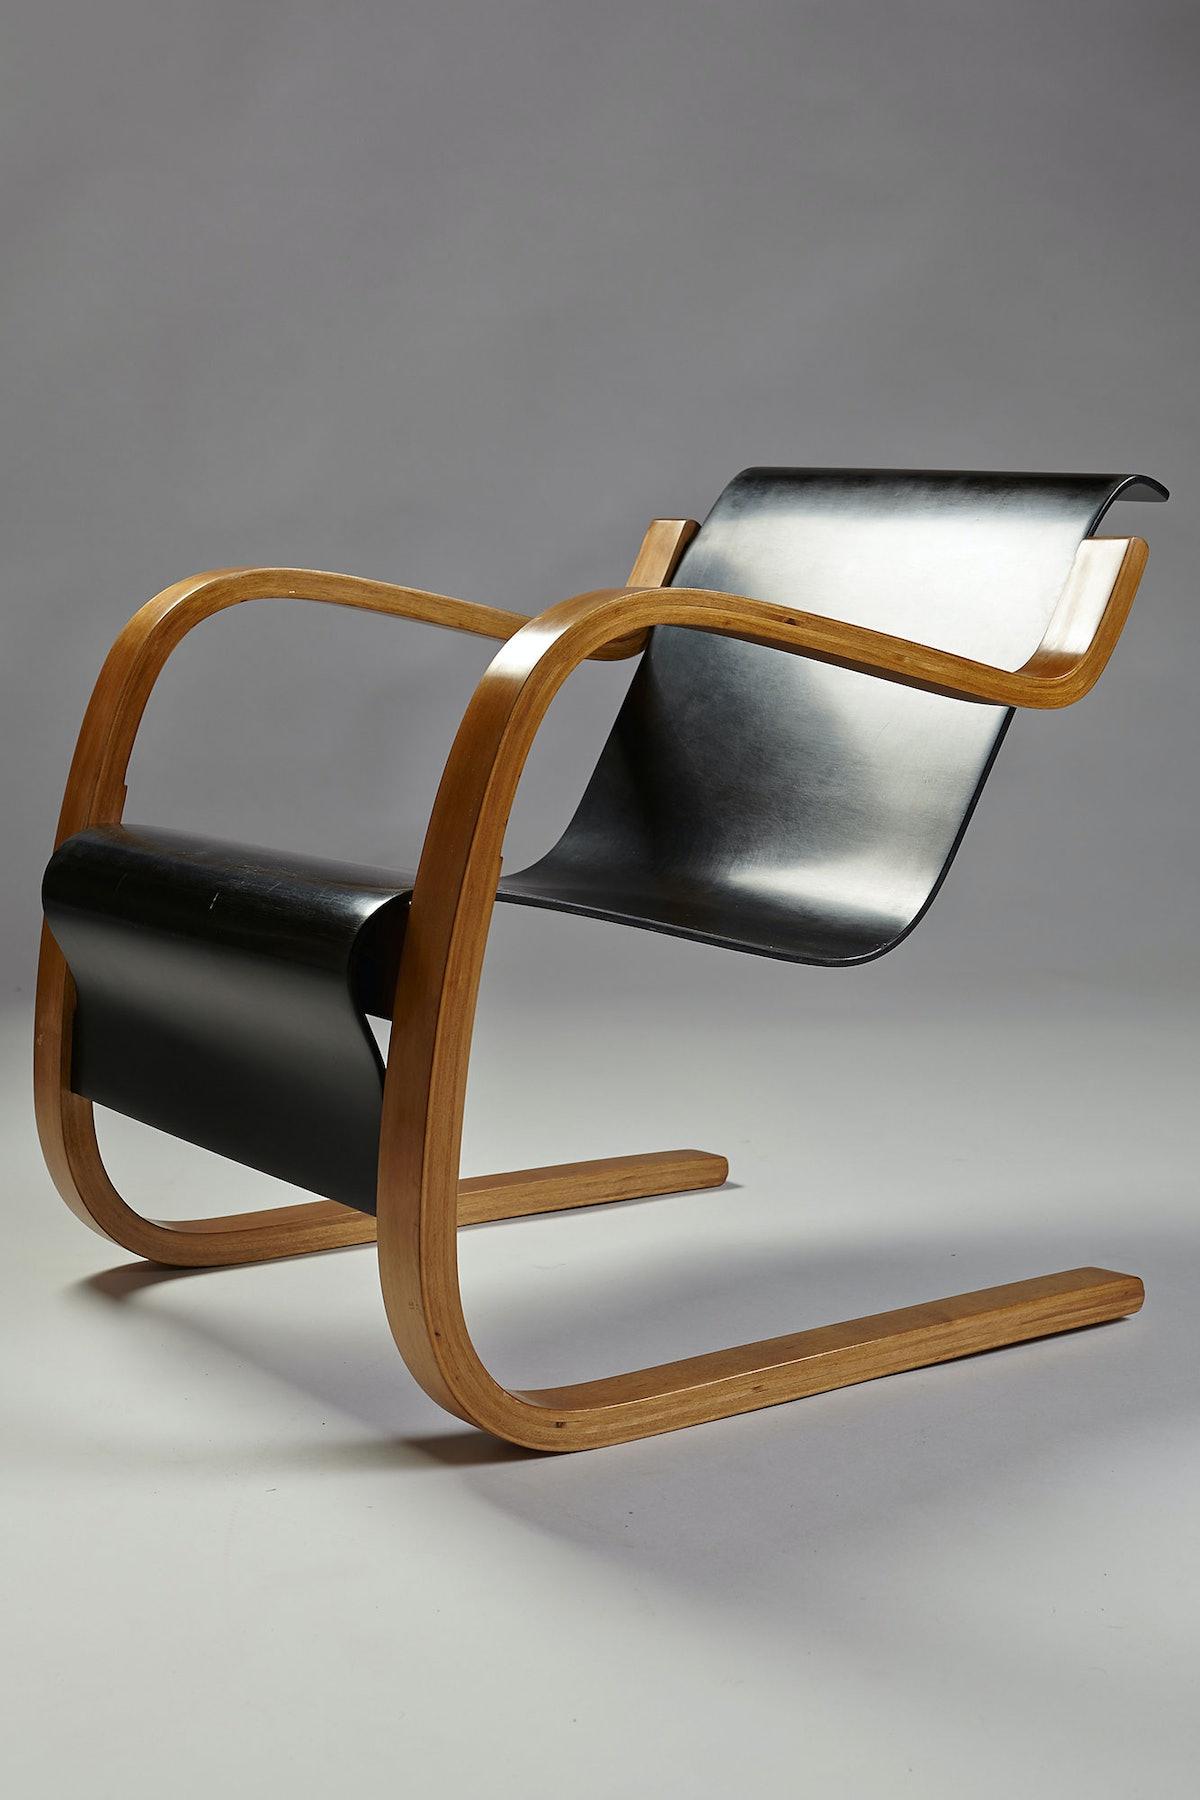 Alvar Aalto, Pair of armchairs